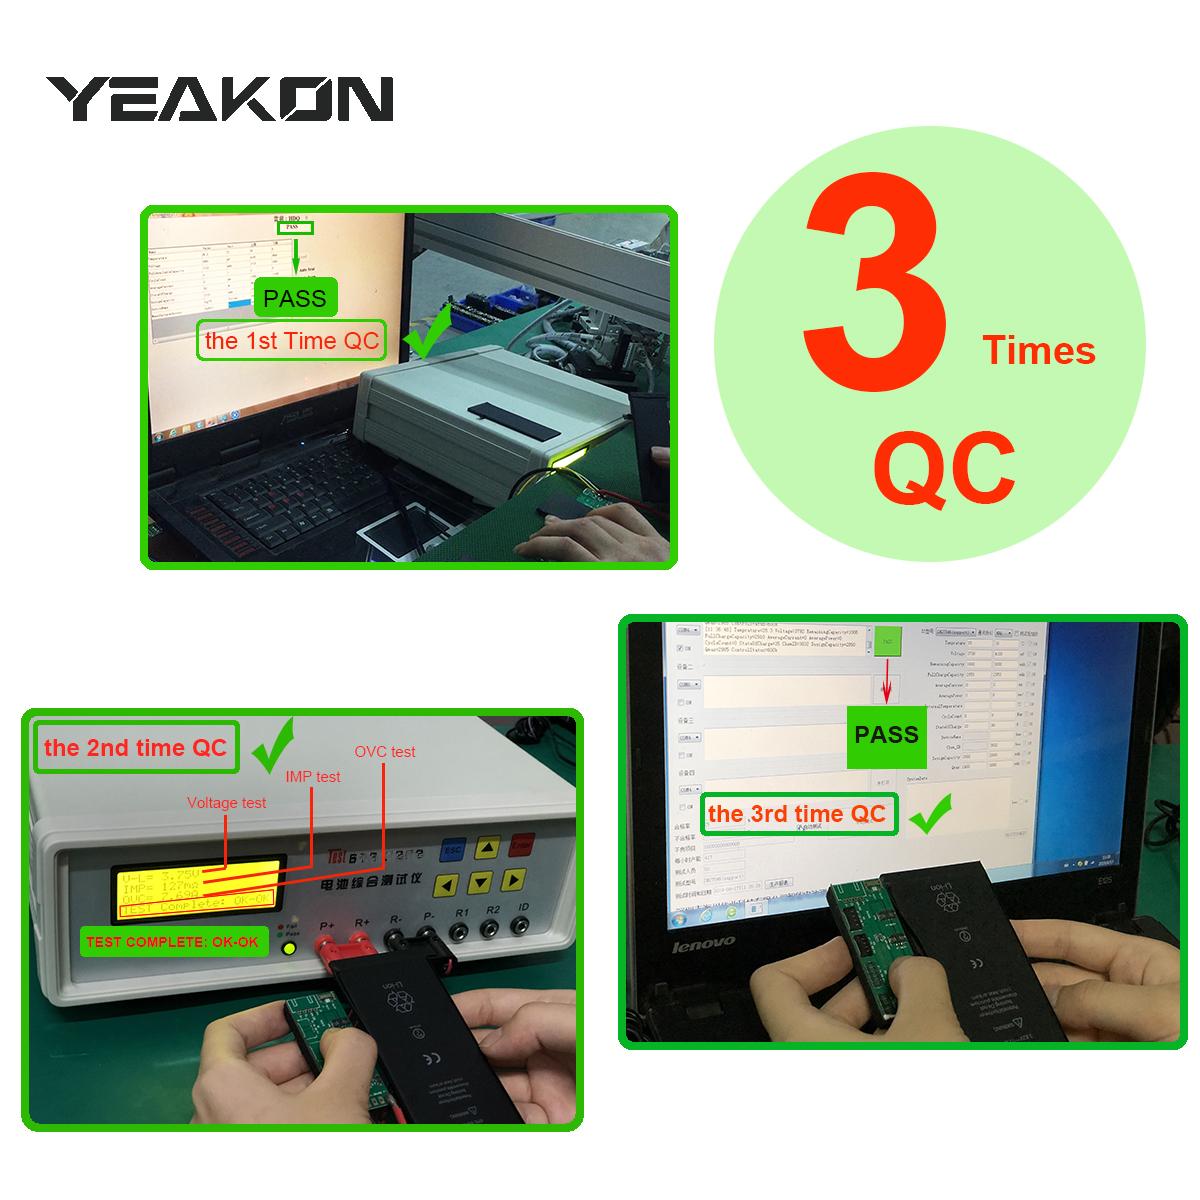 Yeakon 11 Pro Max запасная аккумуляторная батарея для iPhone 5 5S 5C SE, 6, 6S, 6P 6SP 7 7G 7P 8 8G 8P Plus X XS MAX XR 11 12 Pro MAX батареи